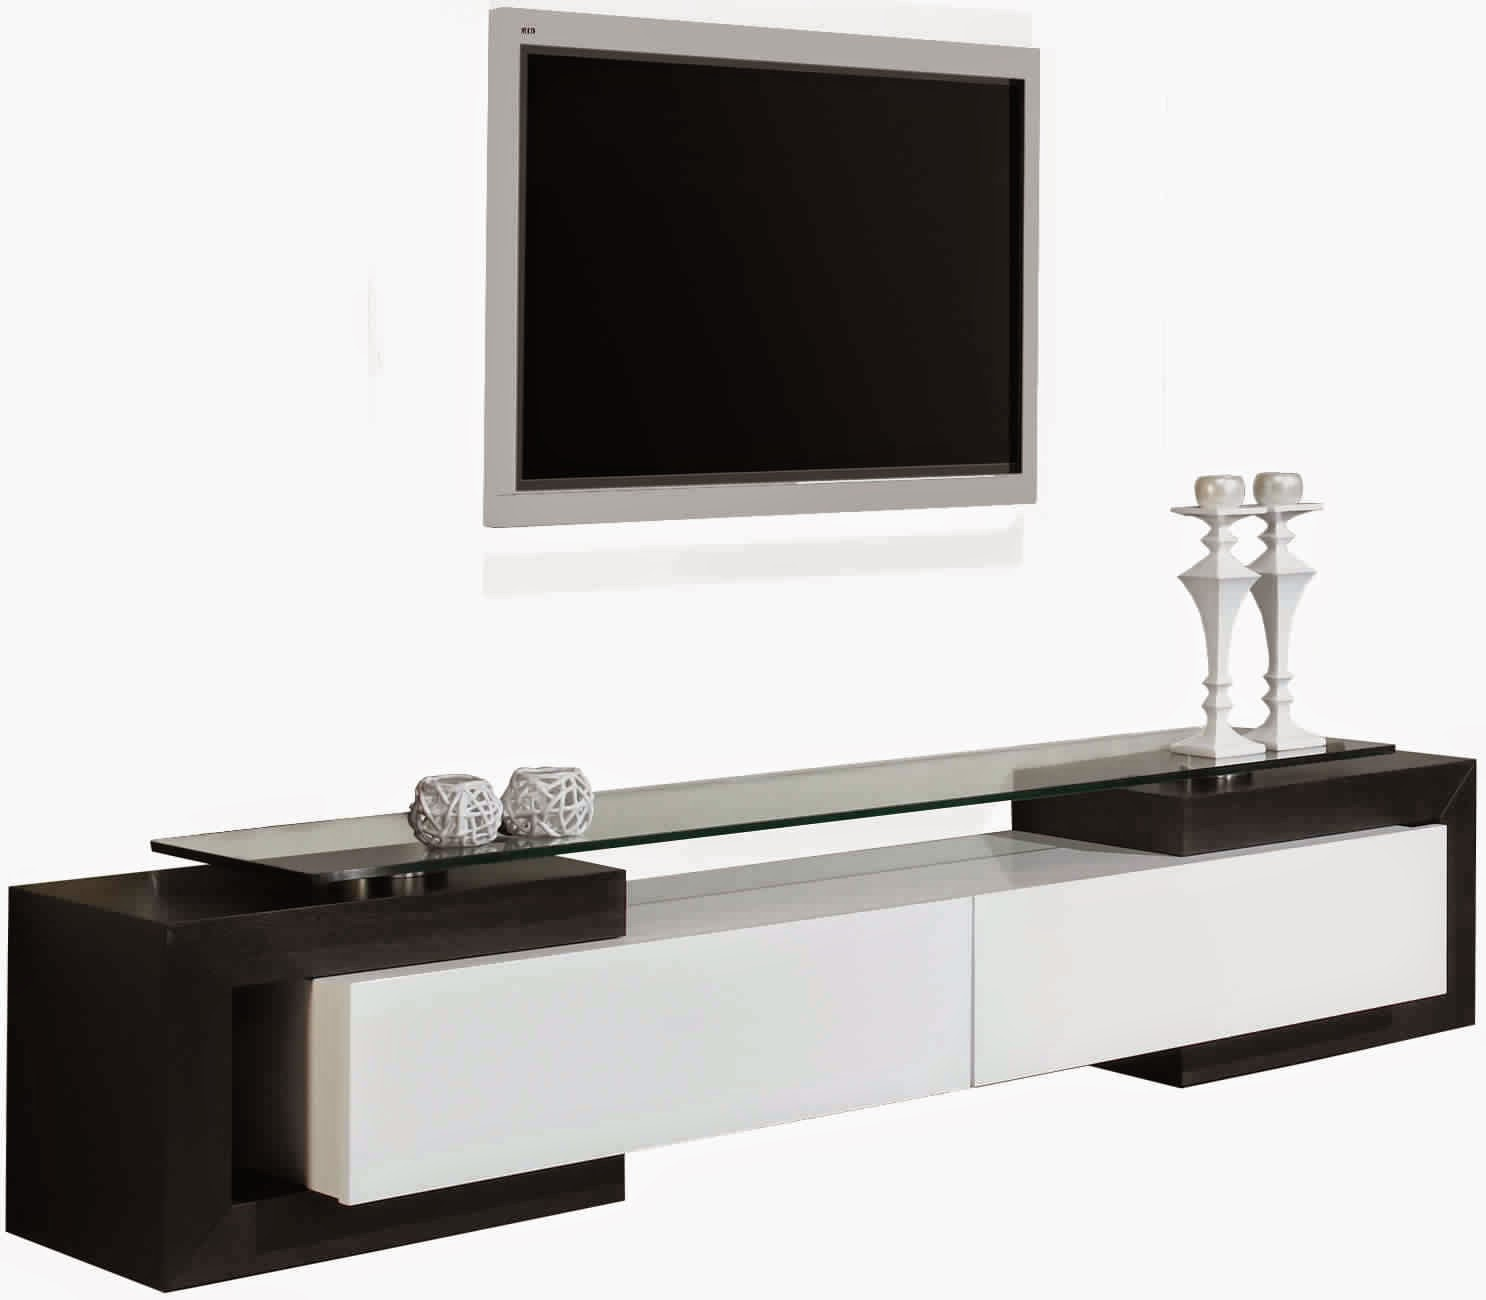 Meuble tv noir et blanc meuble tv for Meuble television blanc